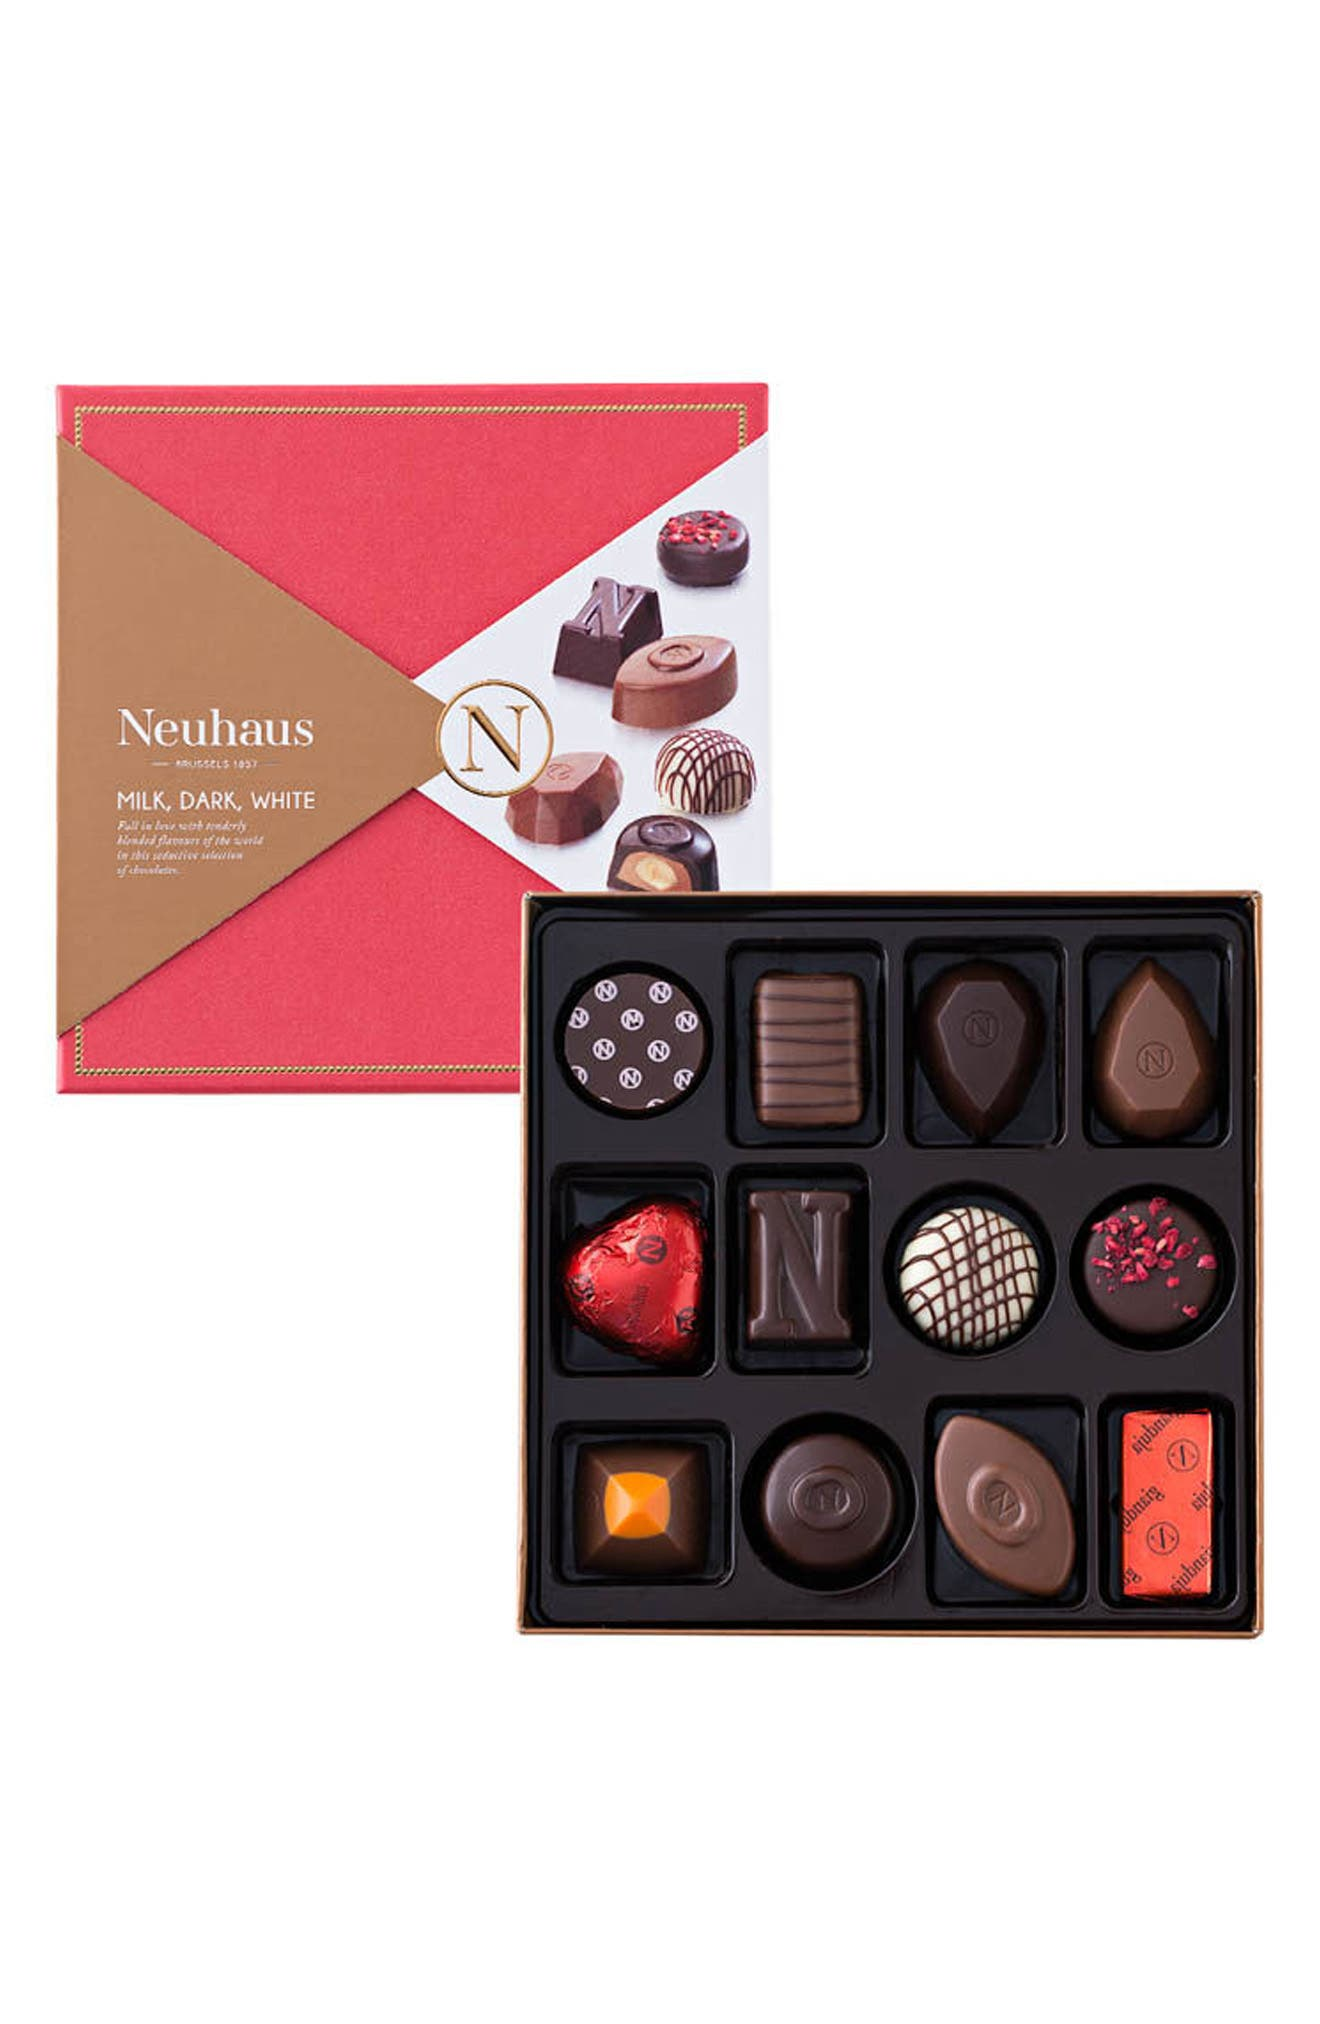 Neuhaus Discovery Collection 12-Piece Chocolate Gift Set